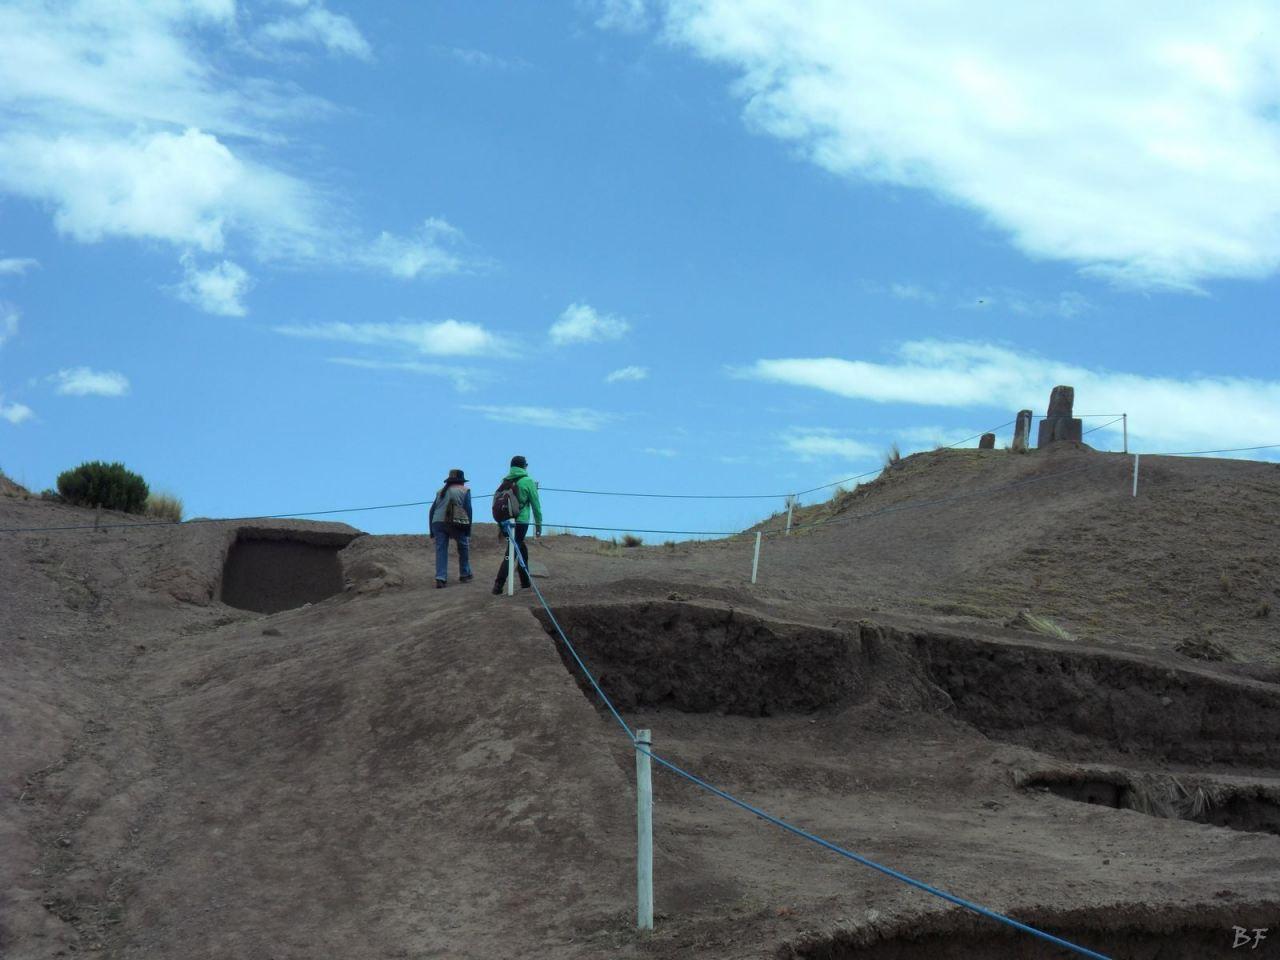 Sito-Megalitico-Piramide-Akapana-Kalasasaya-Menhir-Tiahuanaco-Bolivia-112